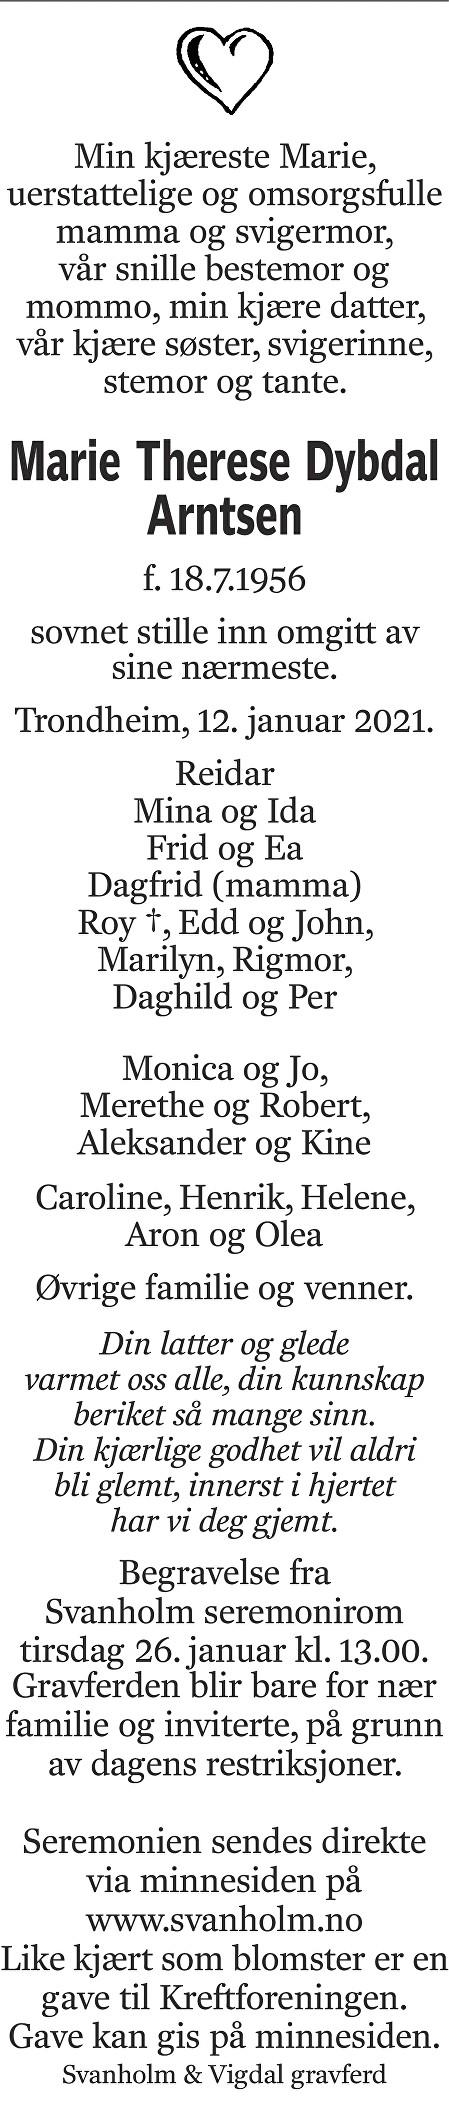 Marie Therese Dybdal Arntsen Dødsannonse